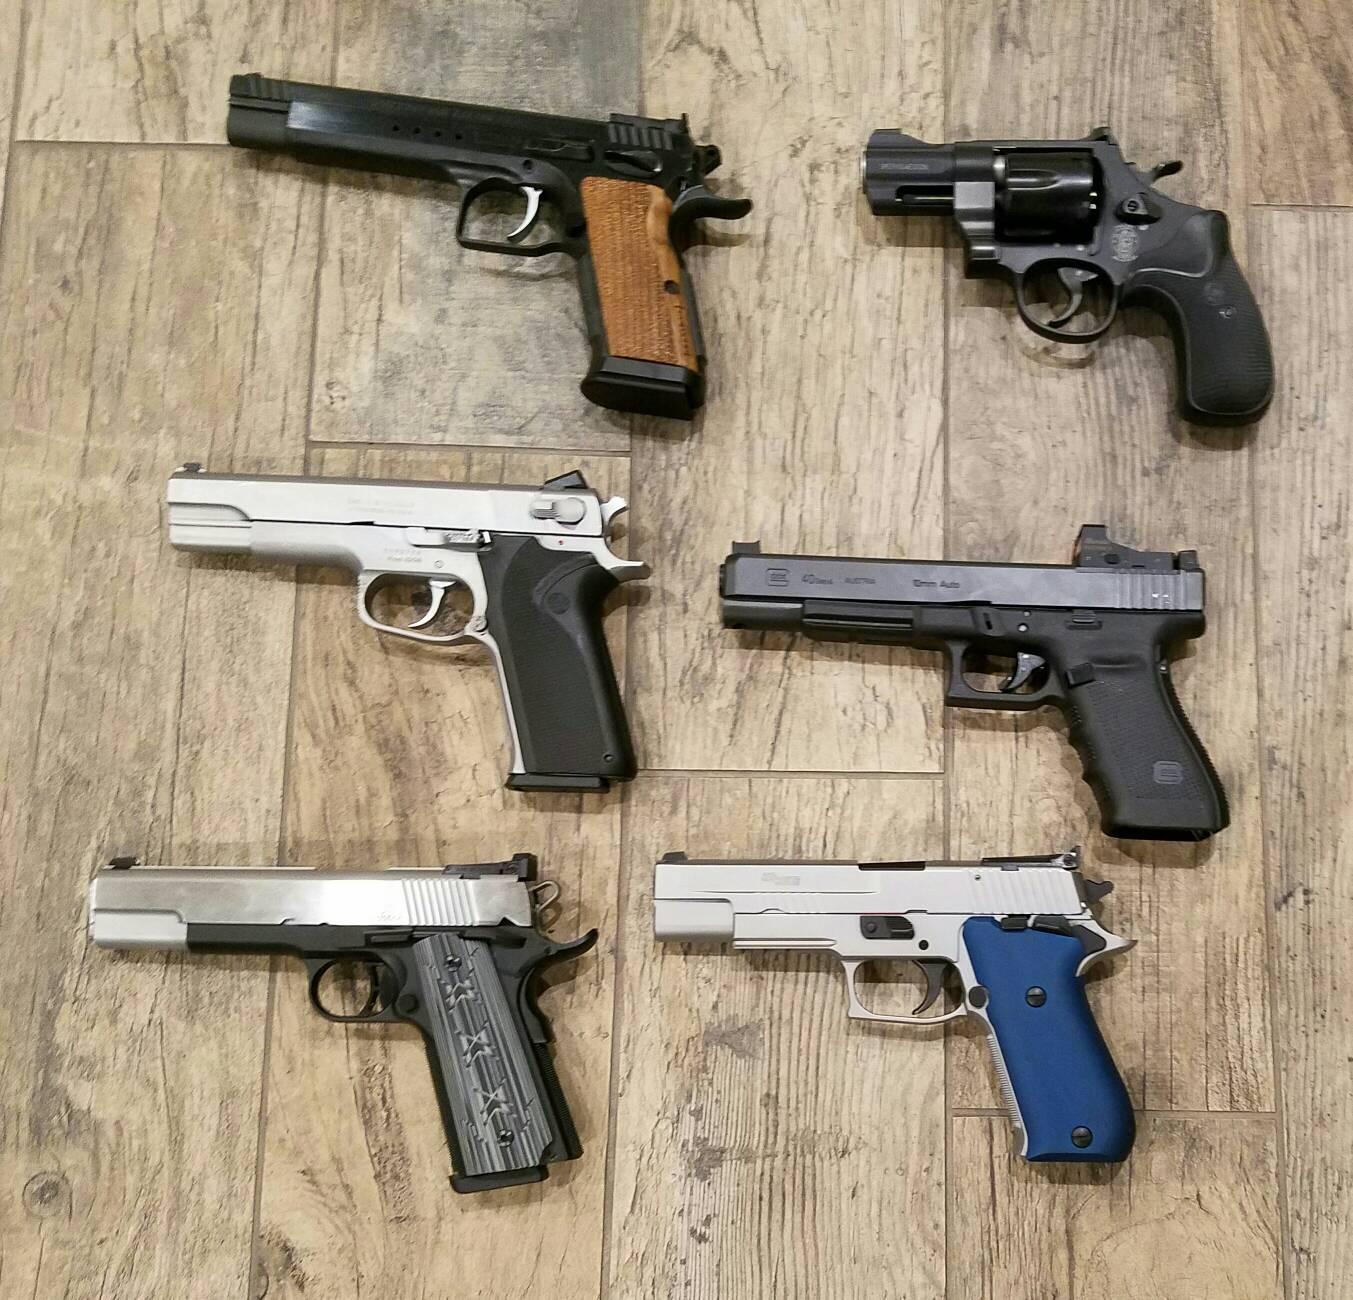 10mm pick: Colt Delta Elite, Tanfoglio, Glock 20, or Sig P220